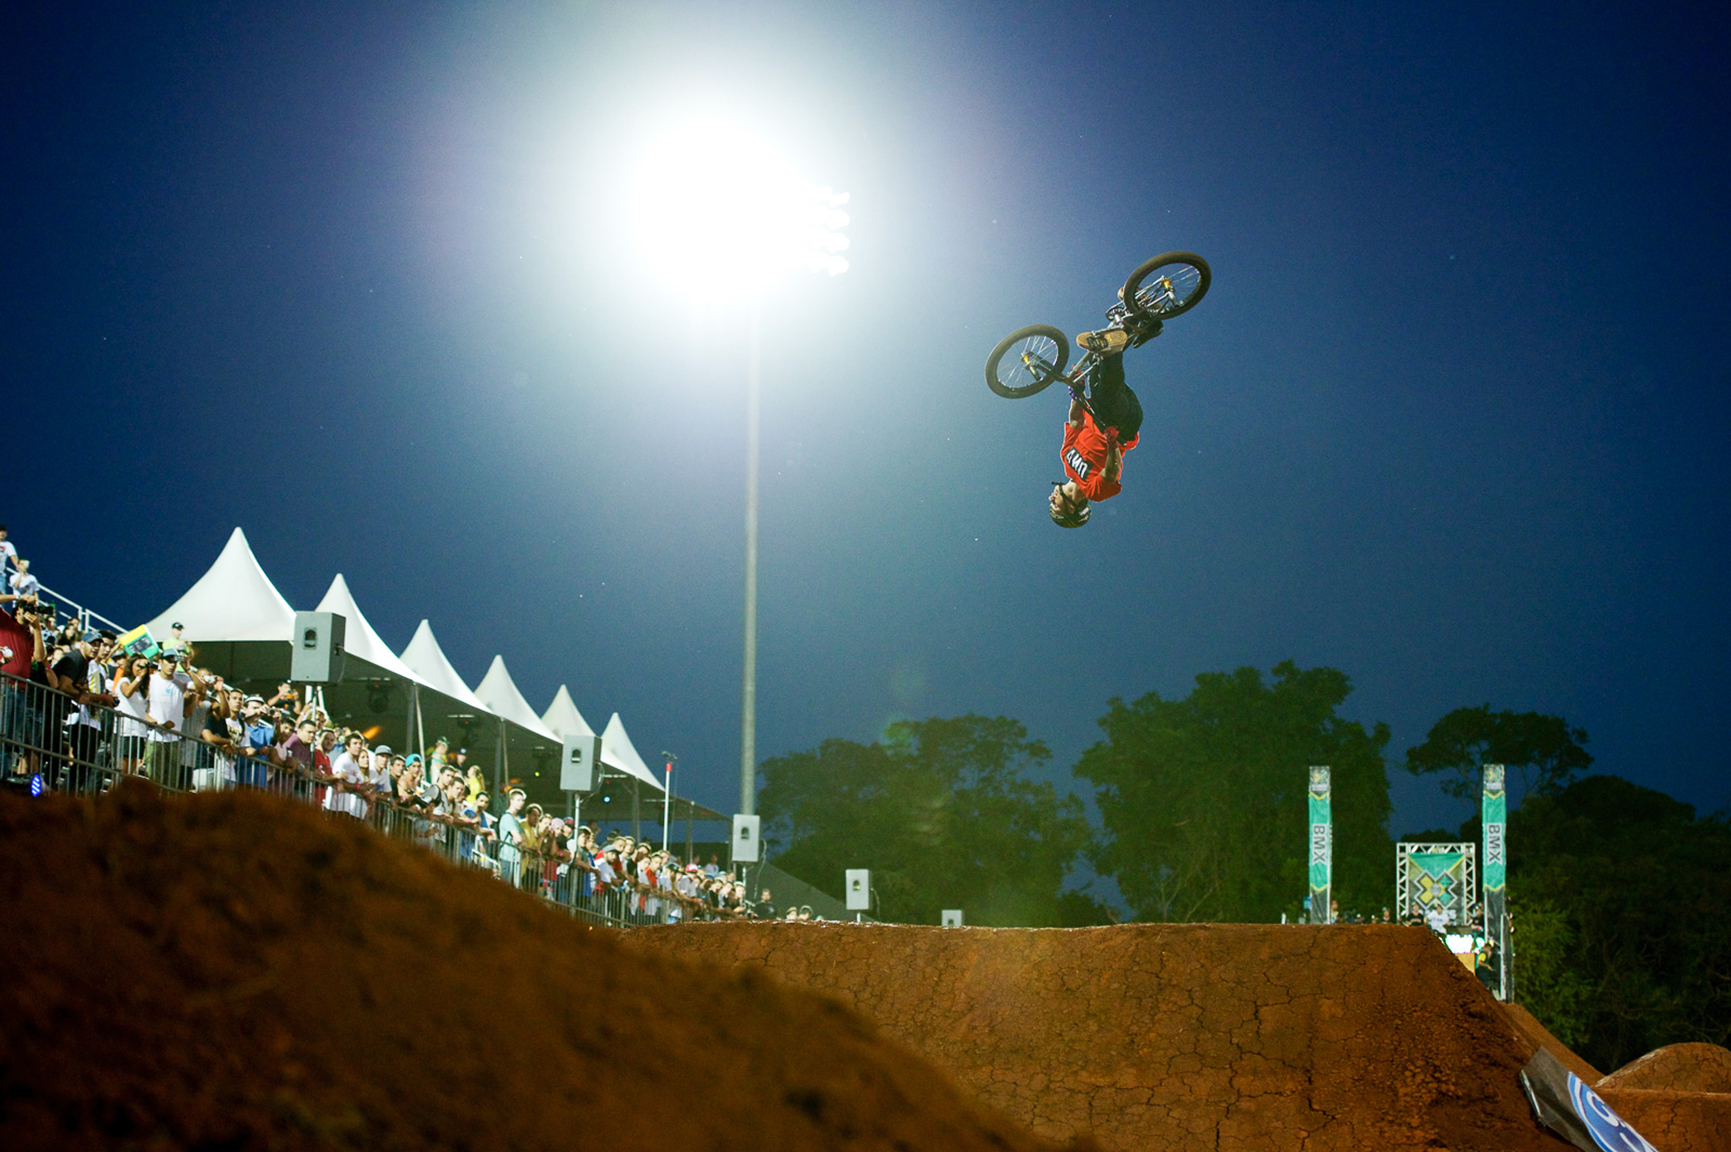 adrenaline junkie adrenaline junkie professional aspirations